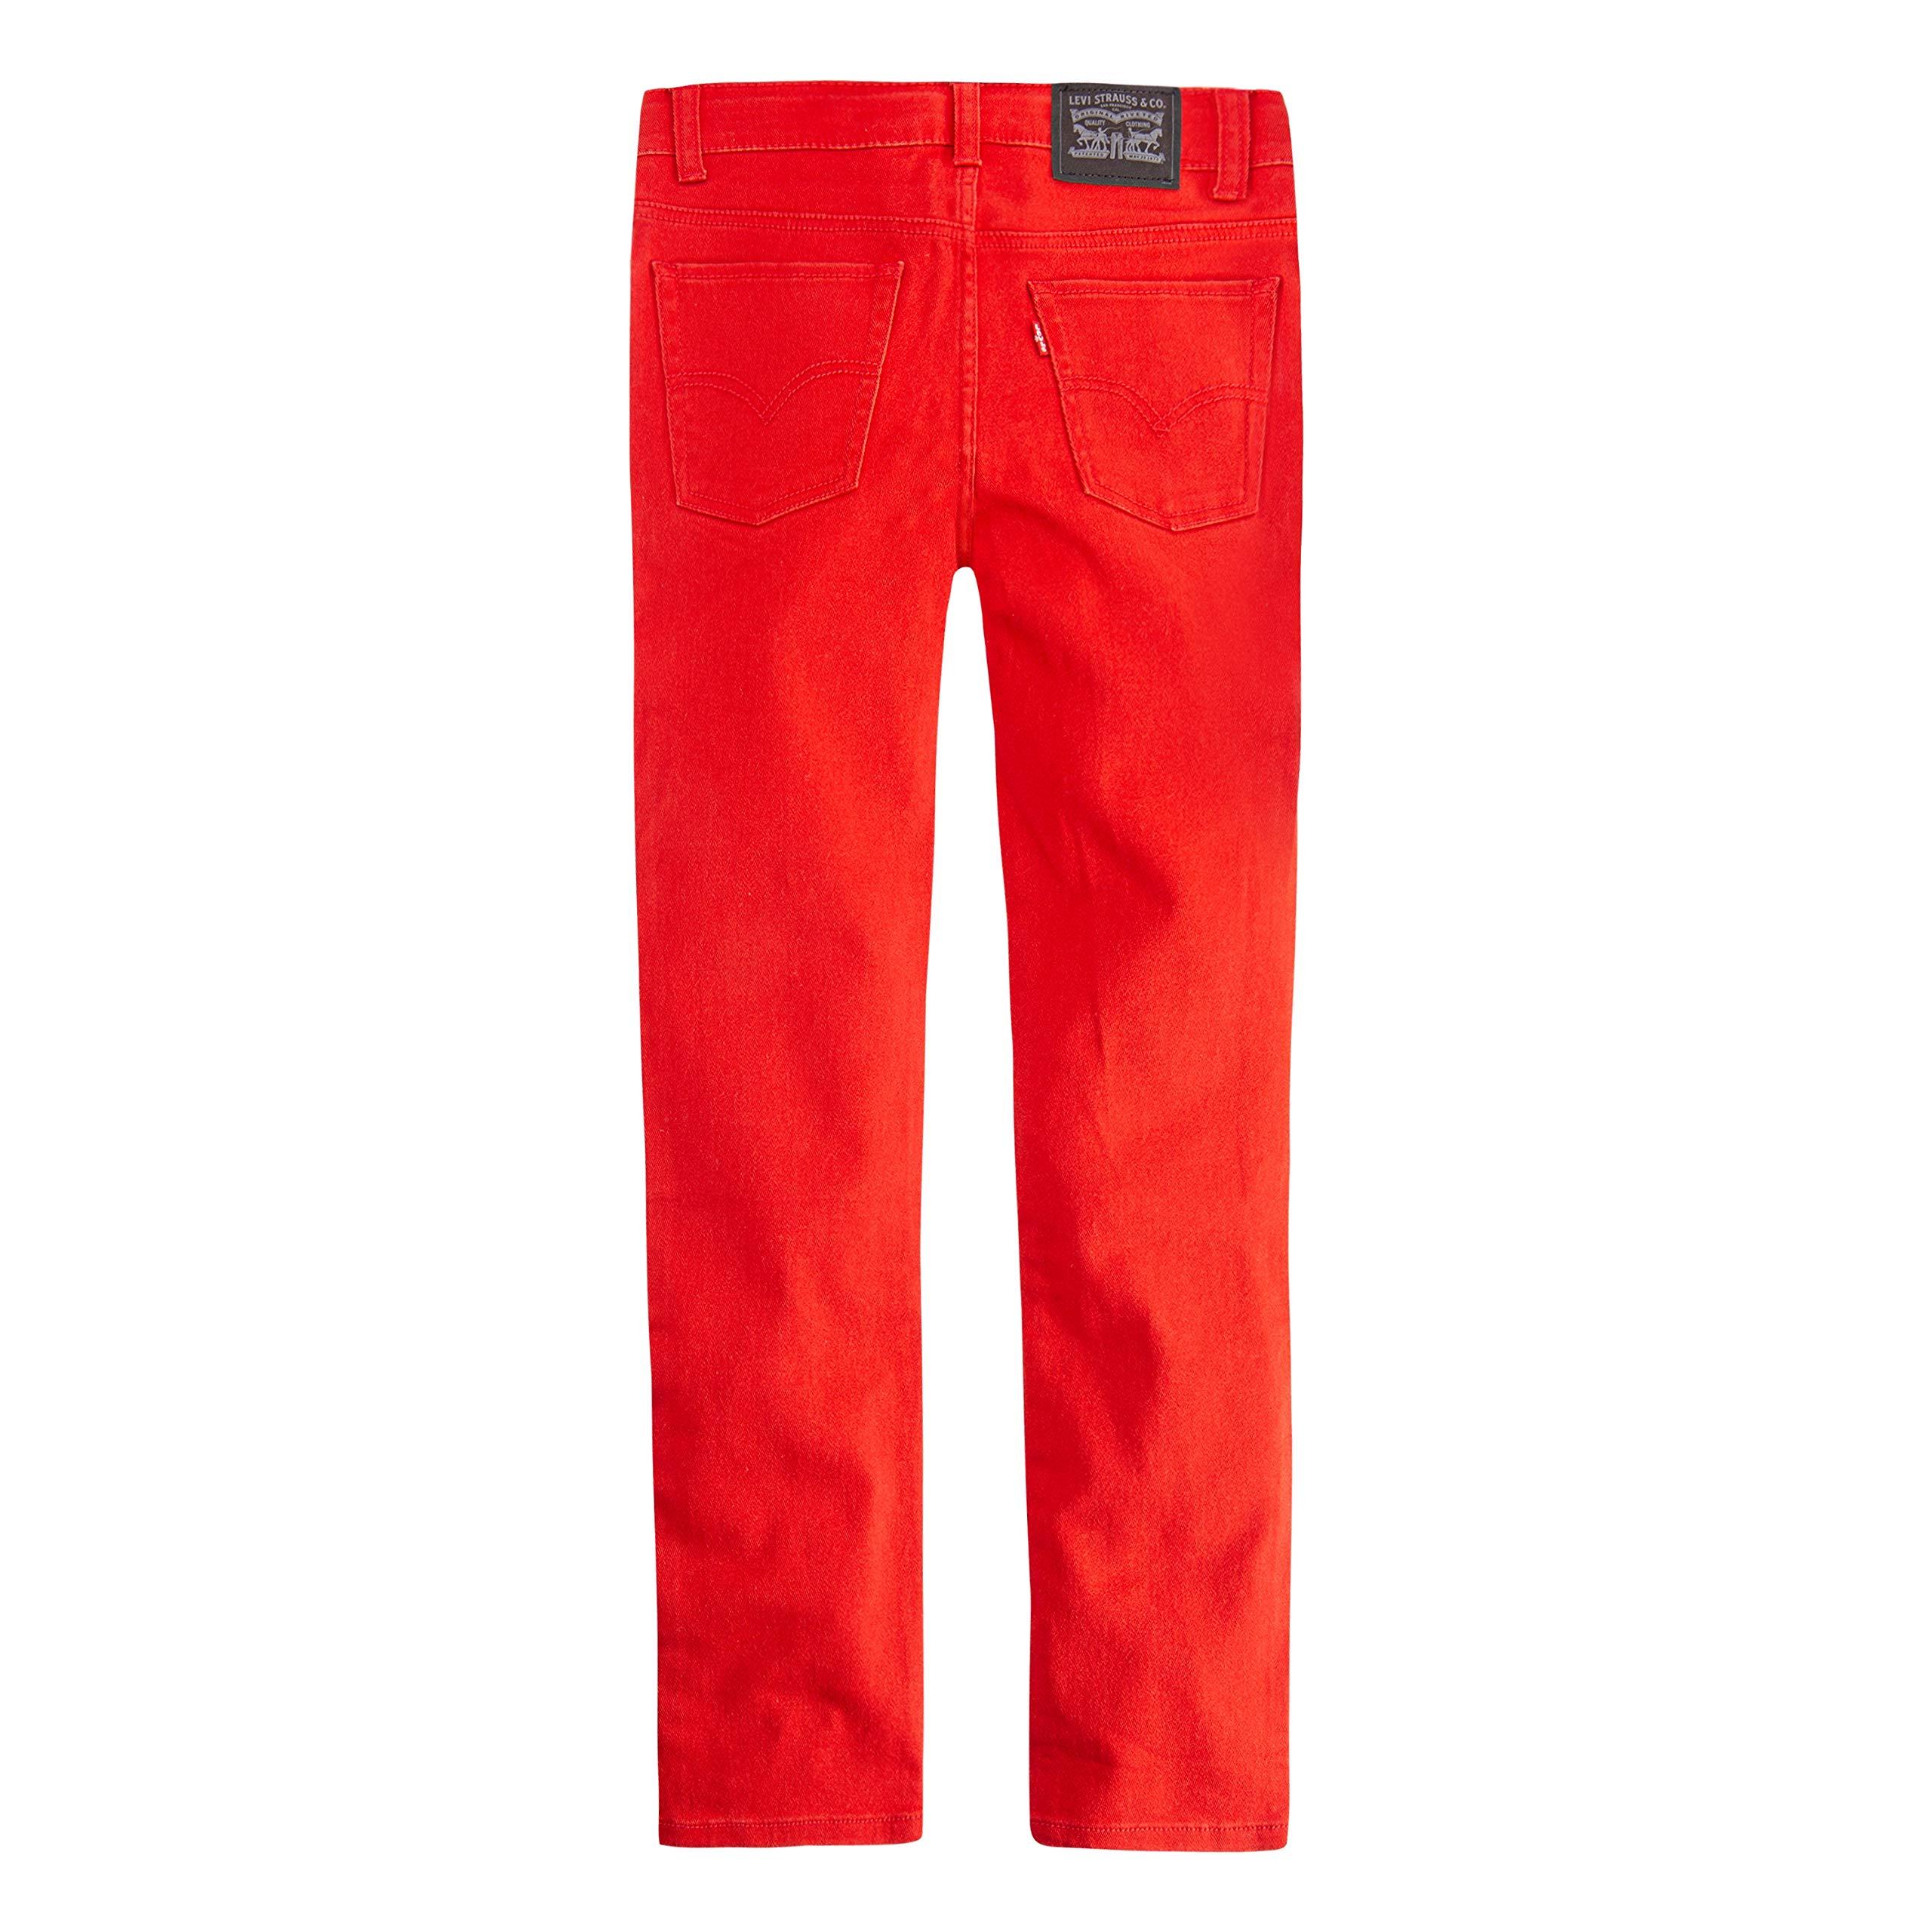 Levi's Boys' Big 510 Skinny Fit Jeans, Aura Orange, 8 by Levi's (Image #2)